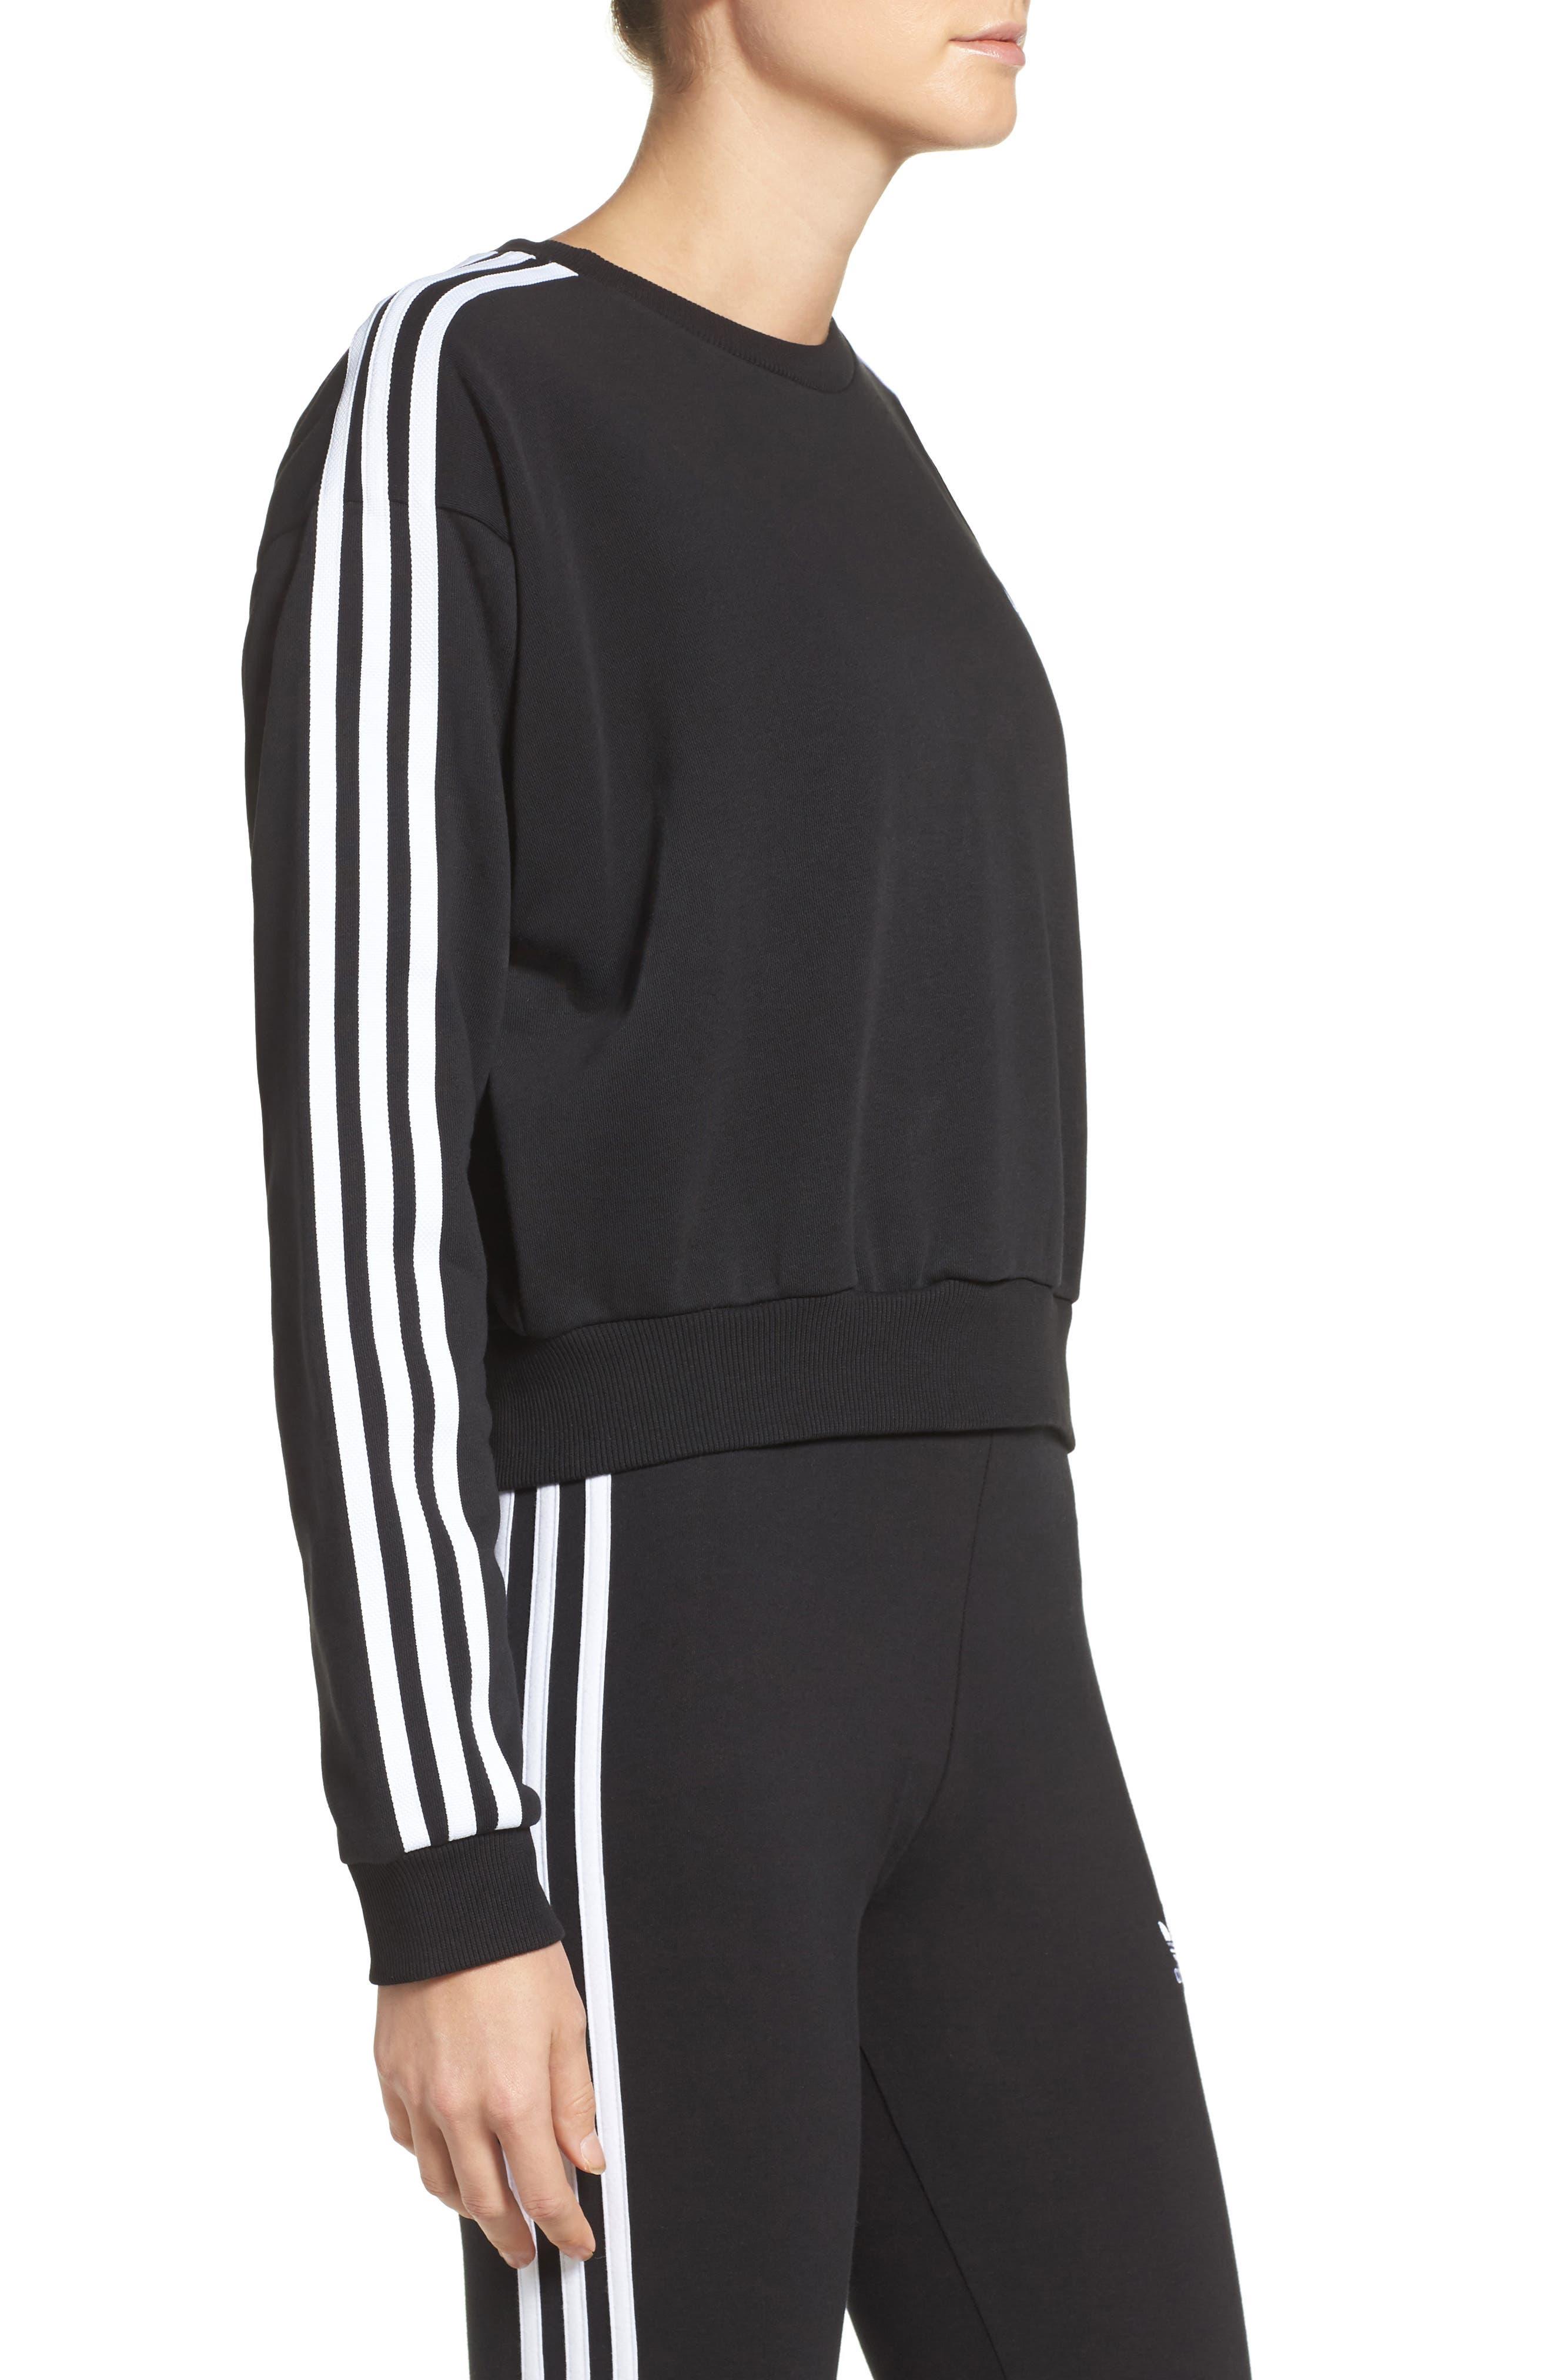 Alternate Image 3  - adidas Originals 3-Stripes Crop Sweatshirt